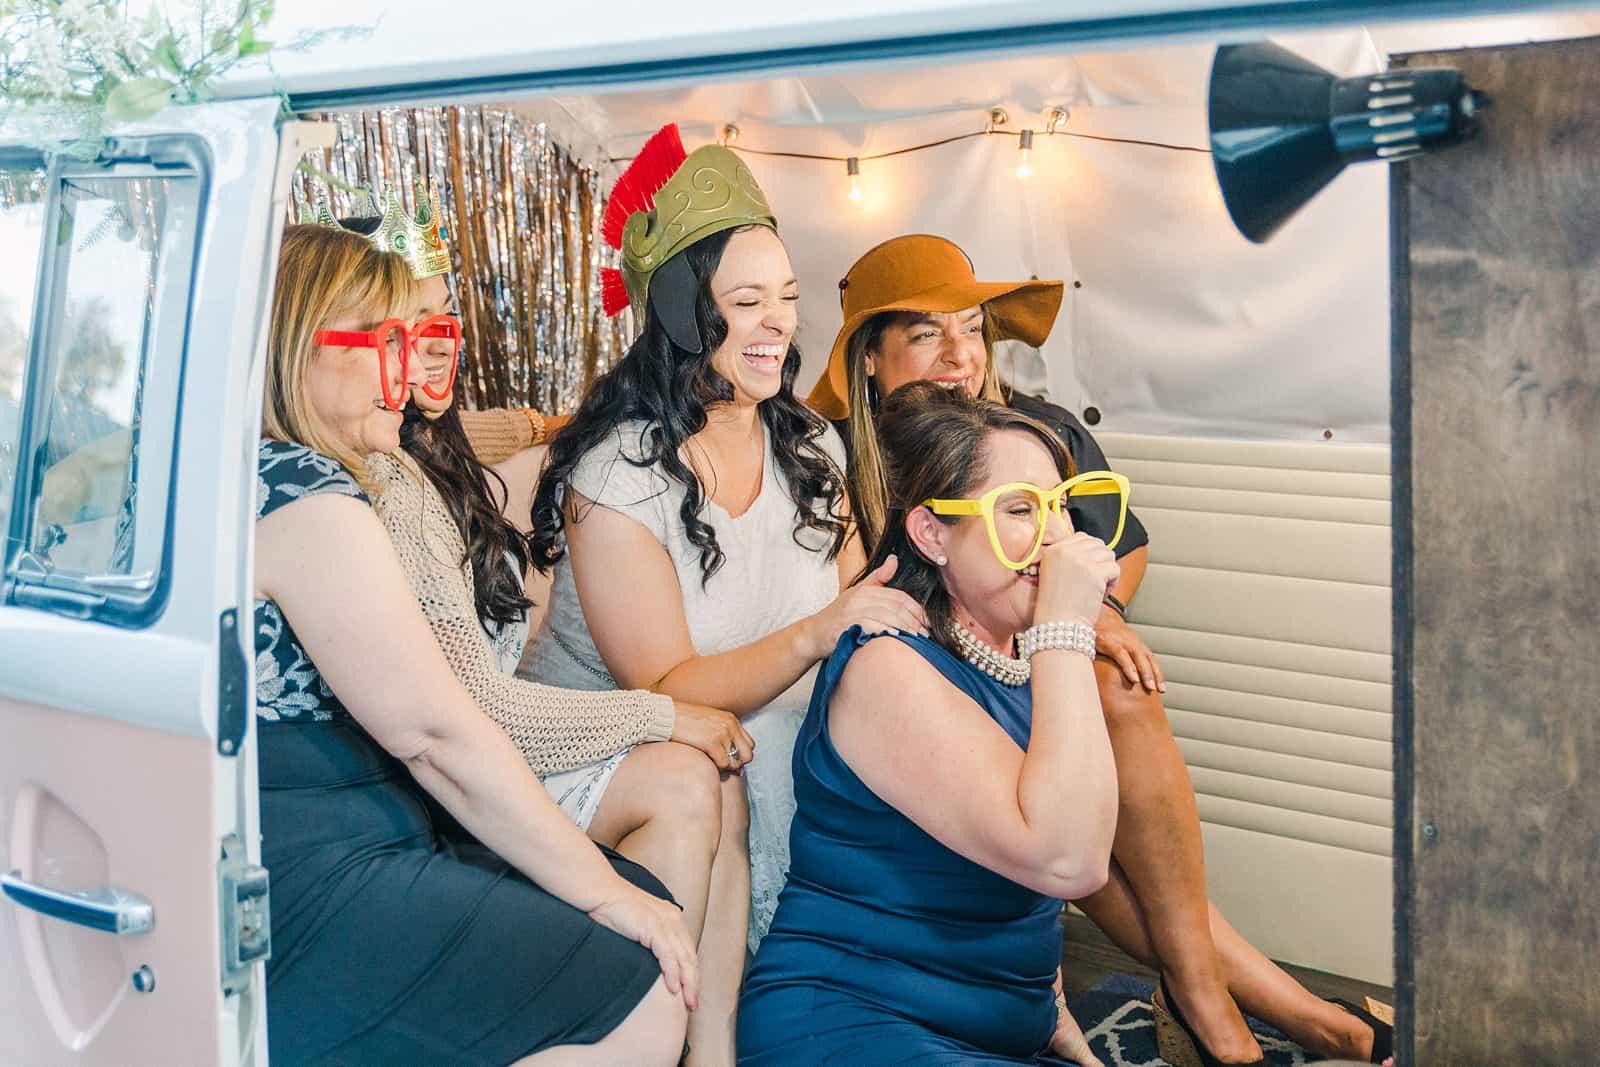 Thomas S. Monson Center Wedding, Salt Lake LDS Temple Wedding, Utah wedding photography, photo booth with props